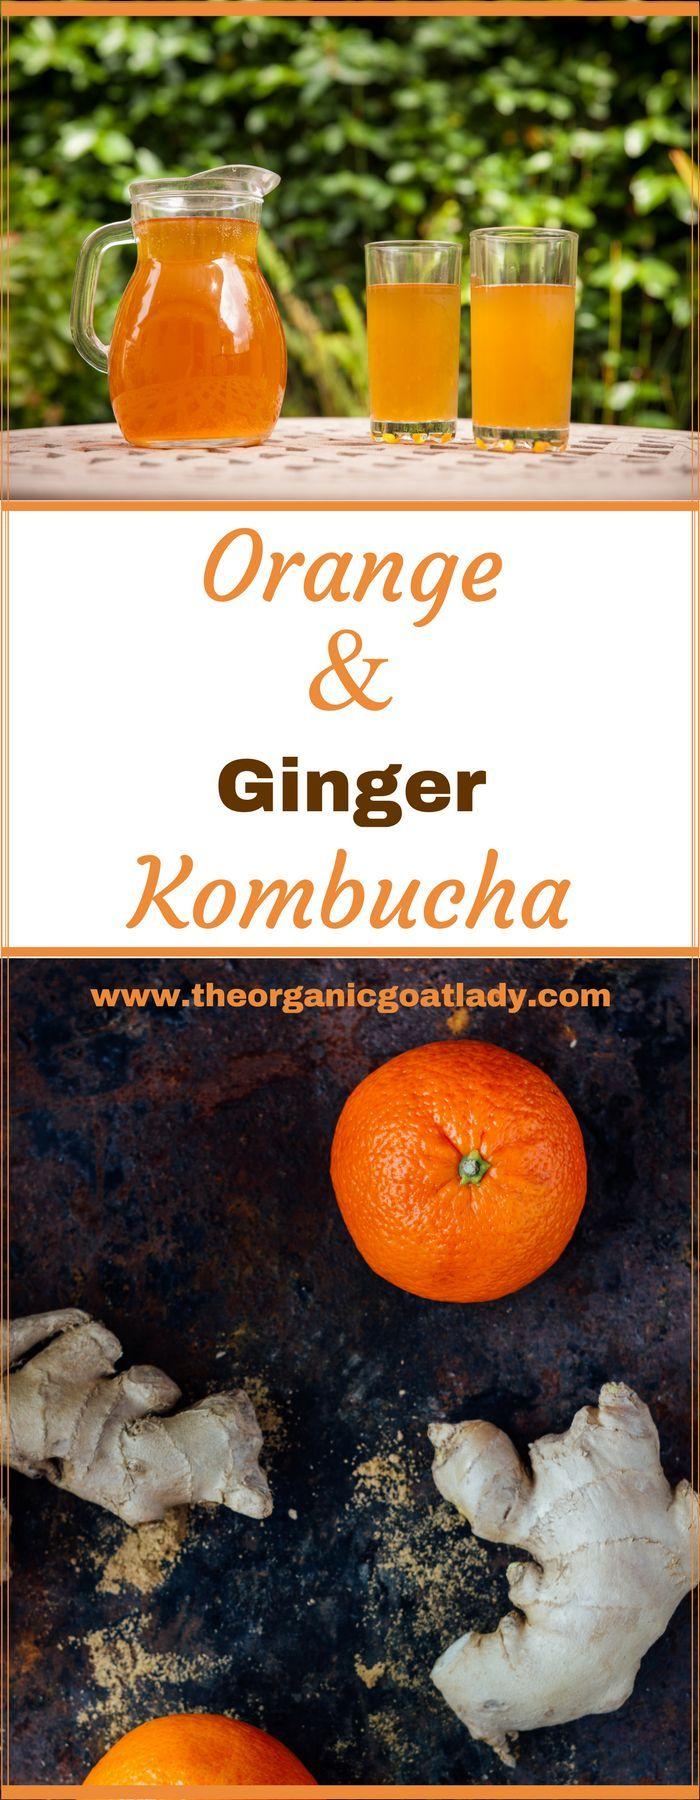 cultures for health kombucha instructions